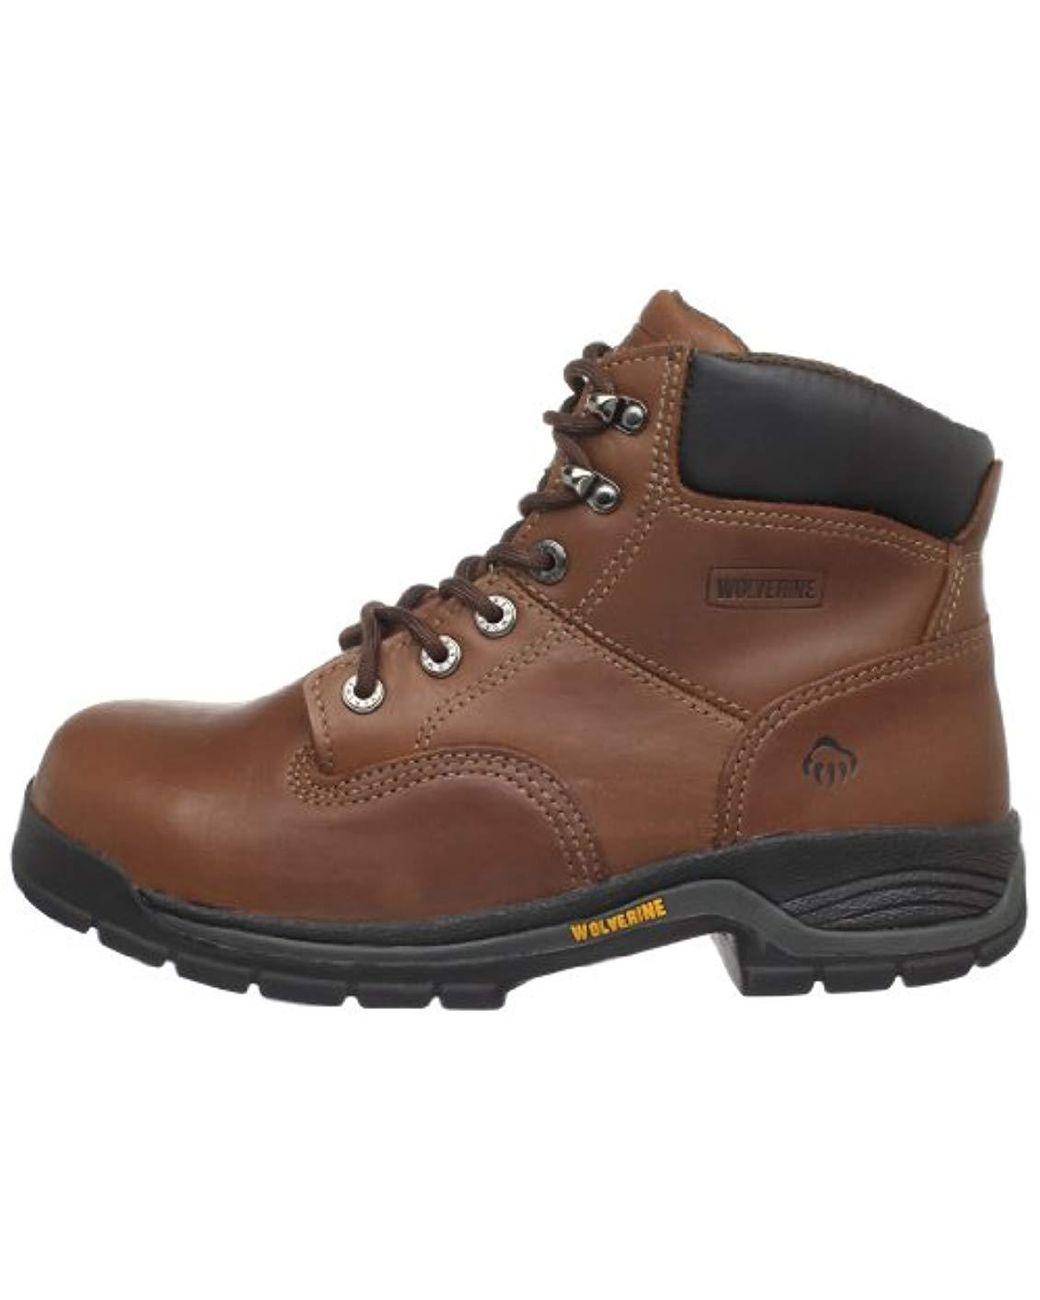 b70eba2f293 Wolverine Harrison W04904 Work Boot,brown Leather,9 Ew Us in Brown ...